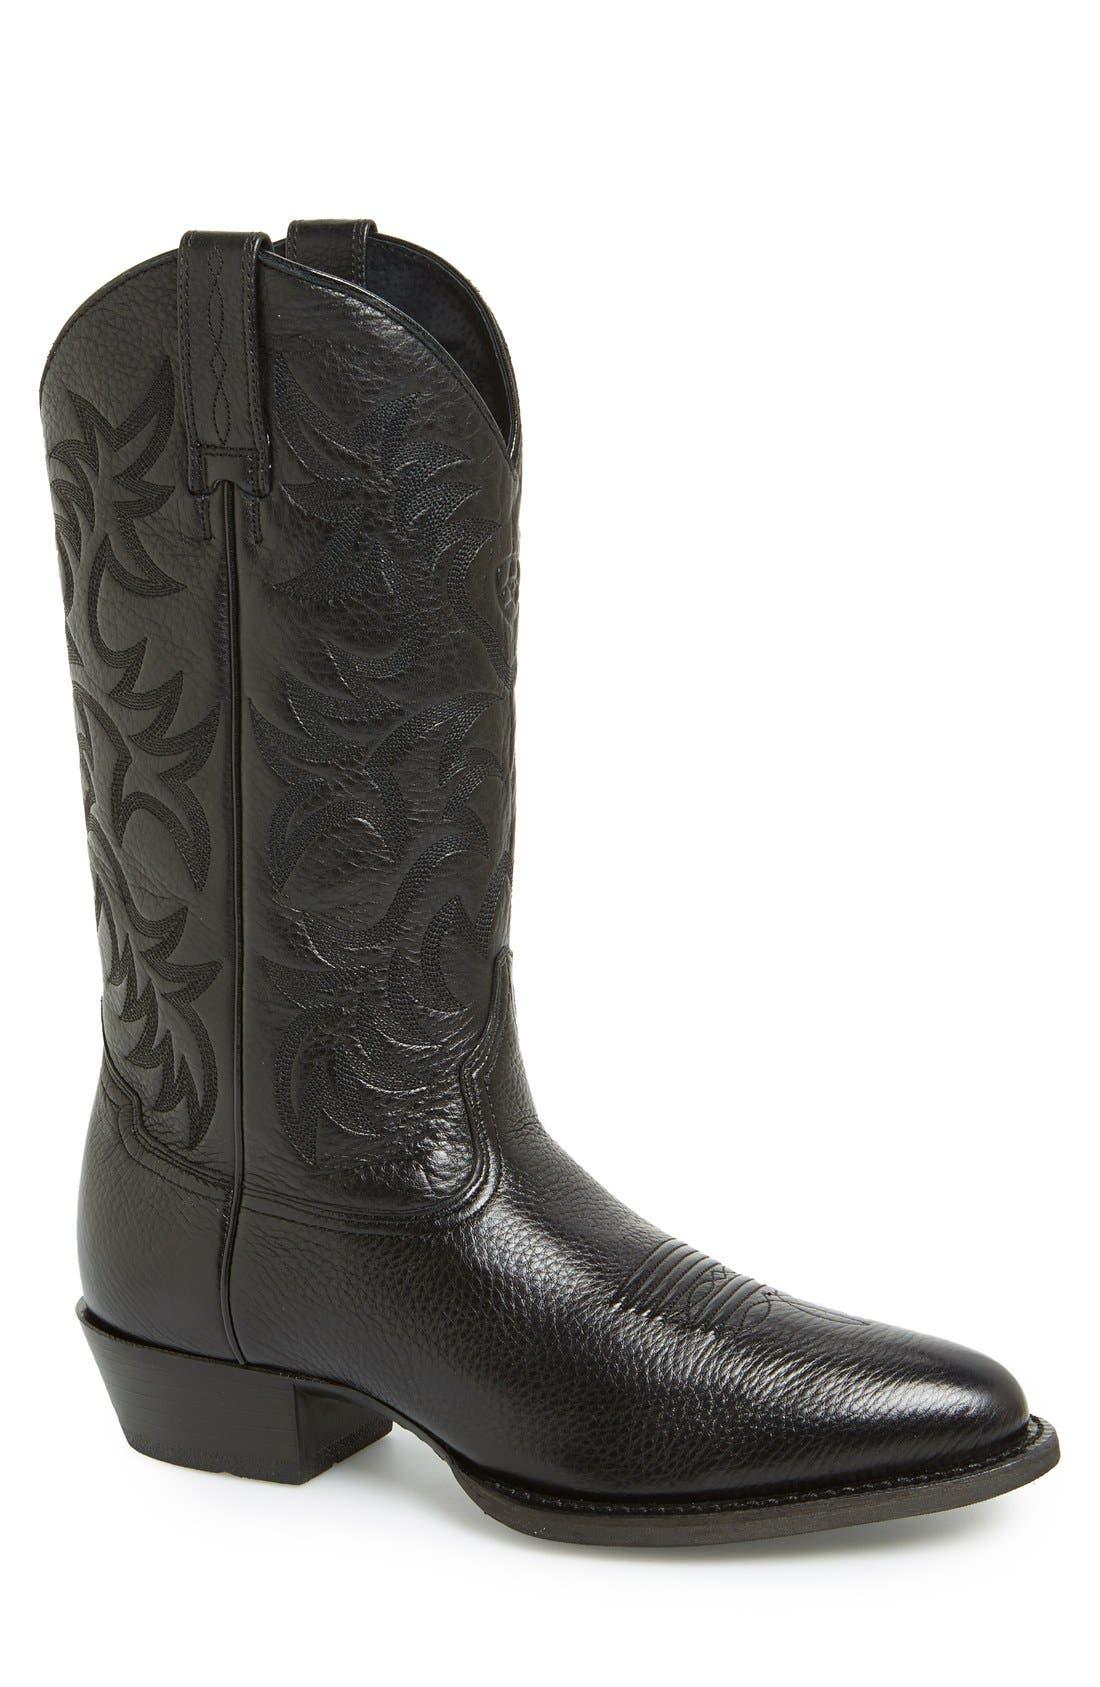 'Heritage' Leather Cowboy R-Toe Boot,                             Main thumbnail 1, color,                             BLACK DEERTAN